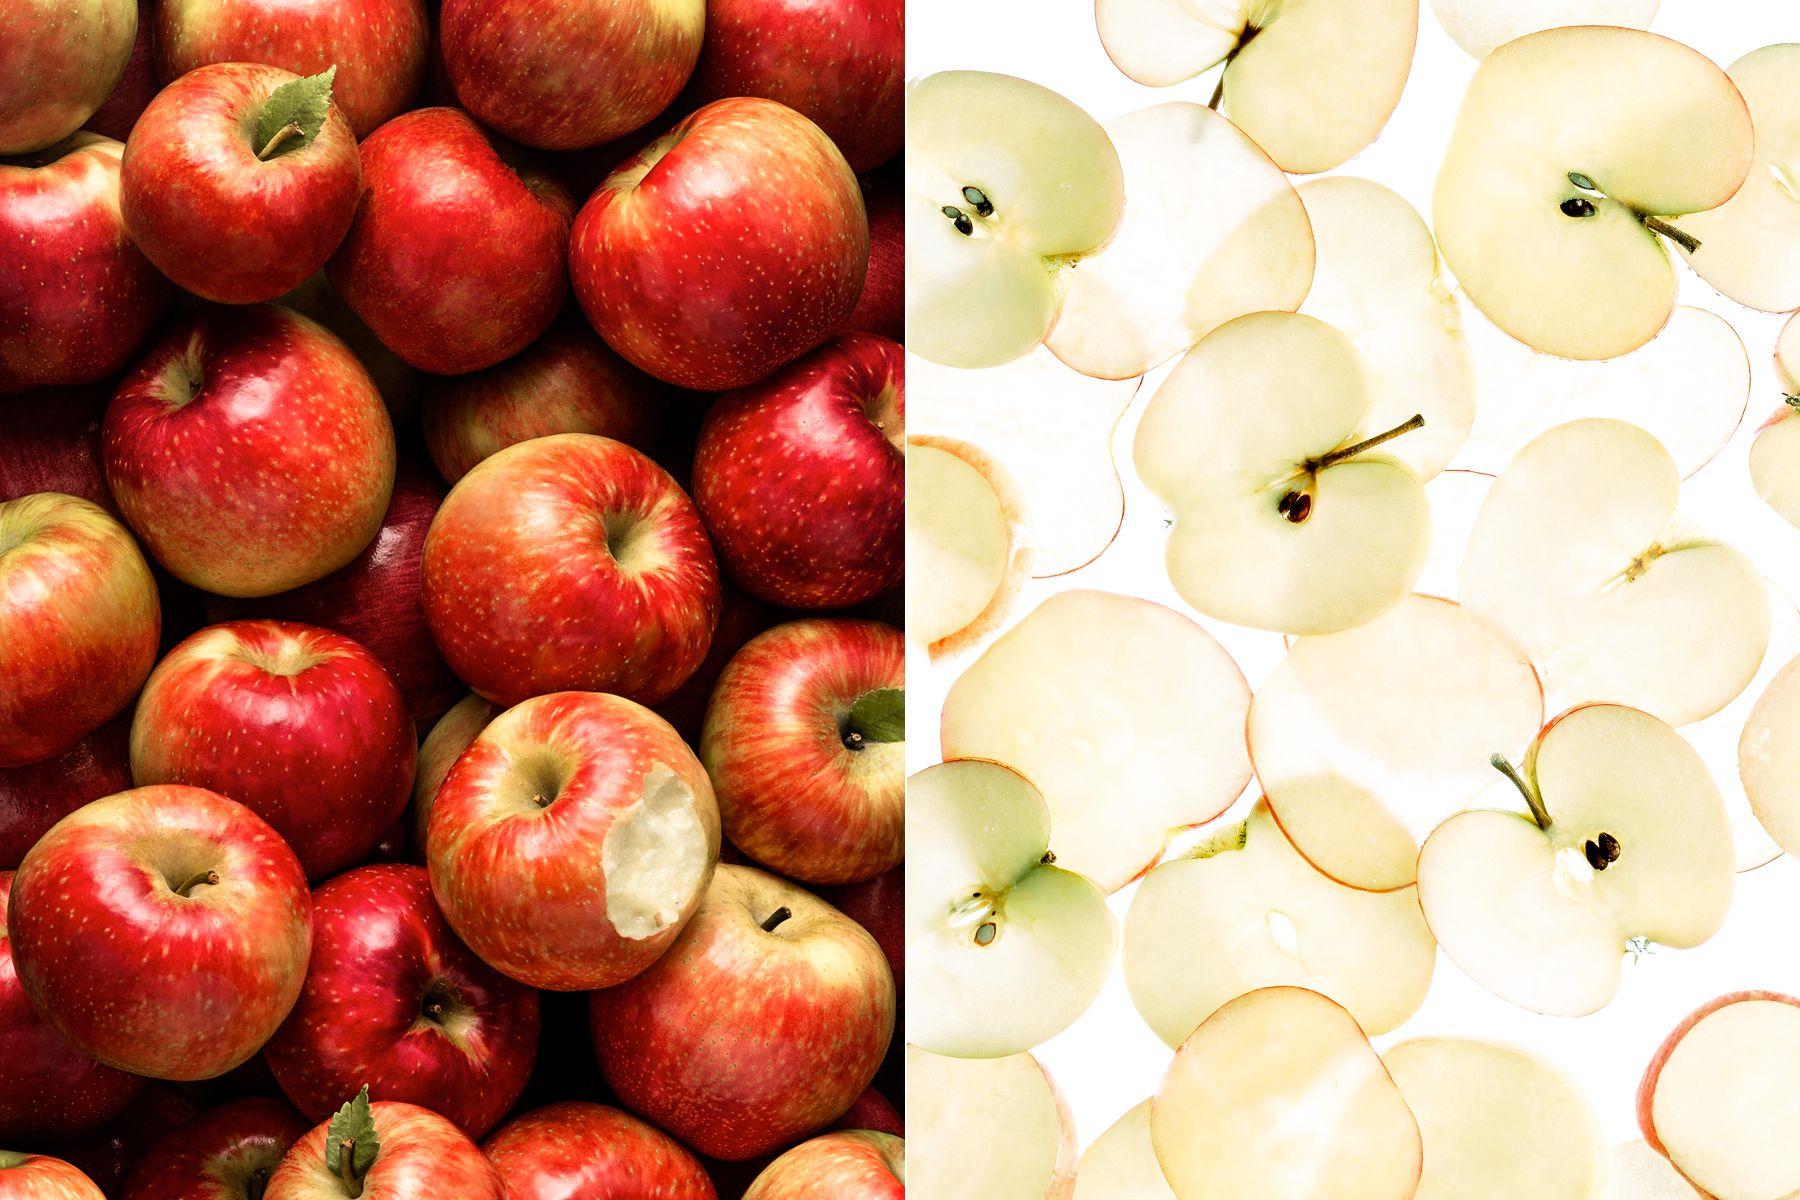 Apples_Slices.jpg